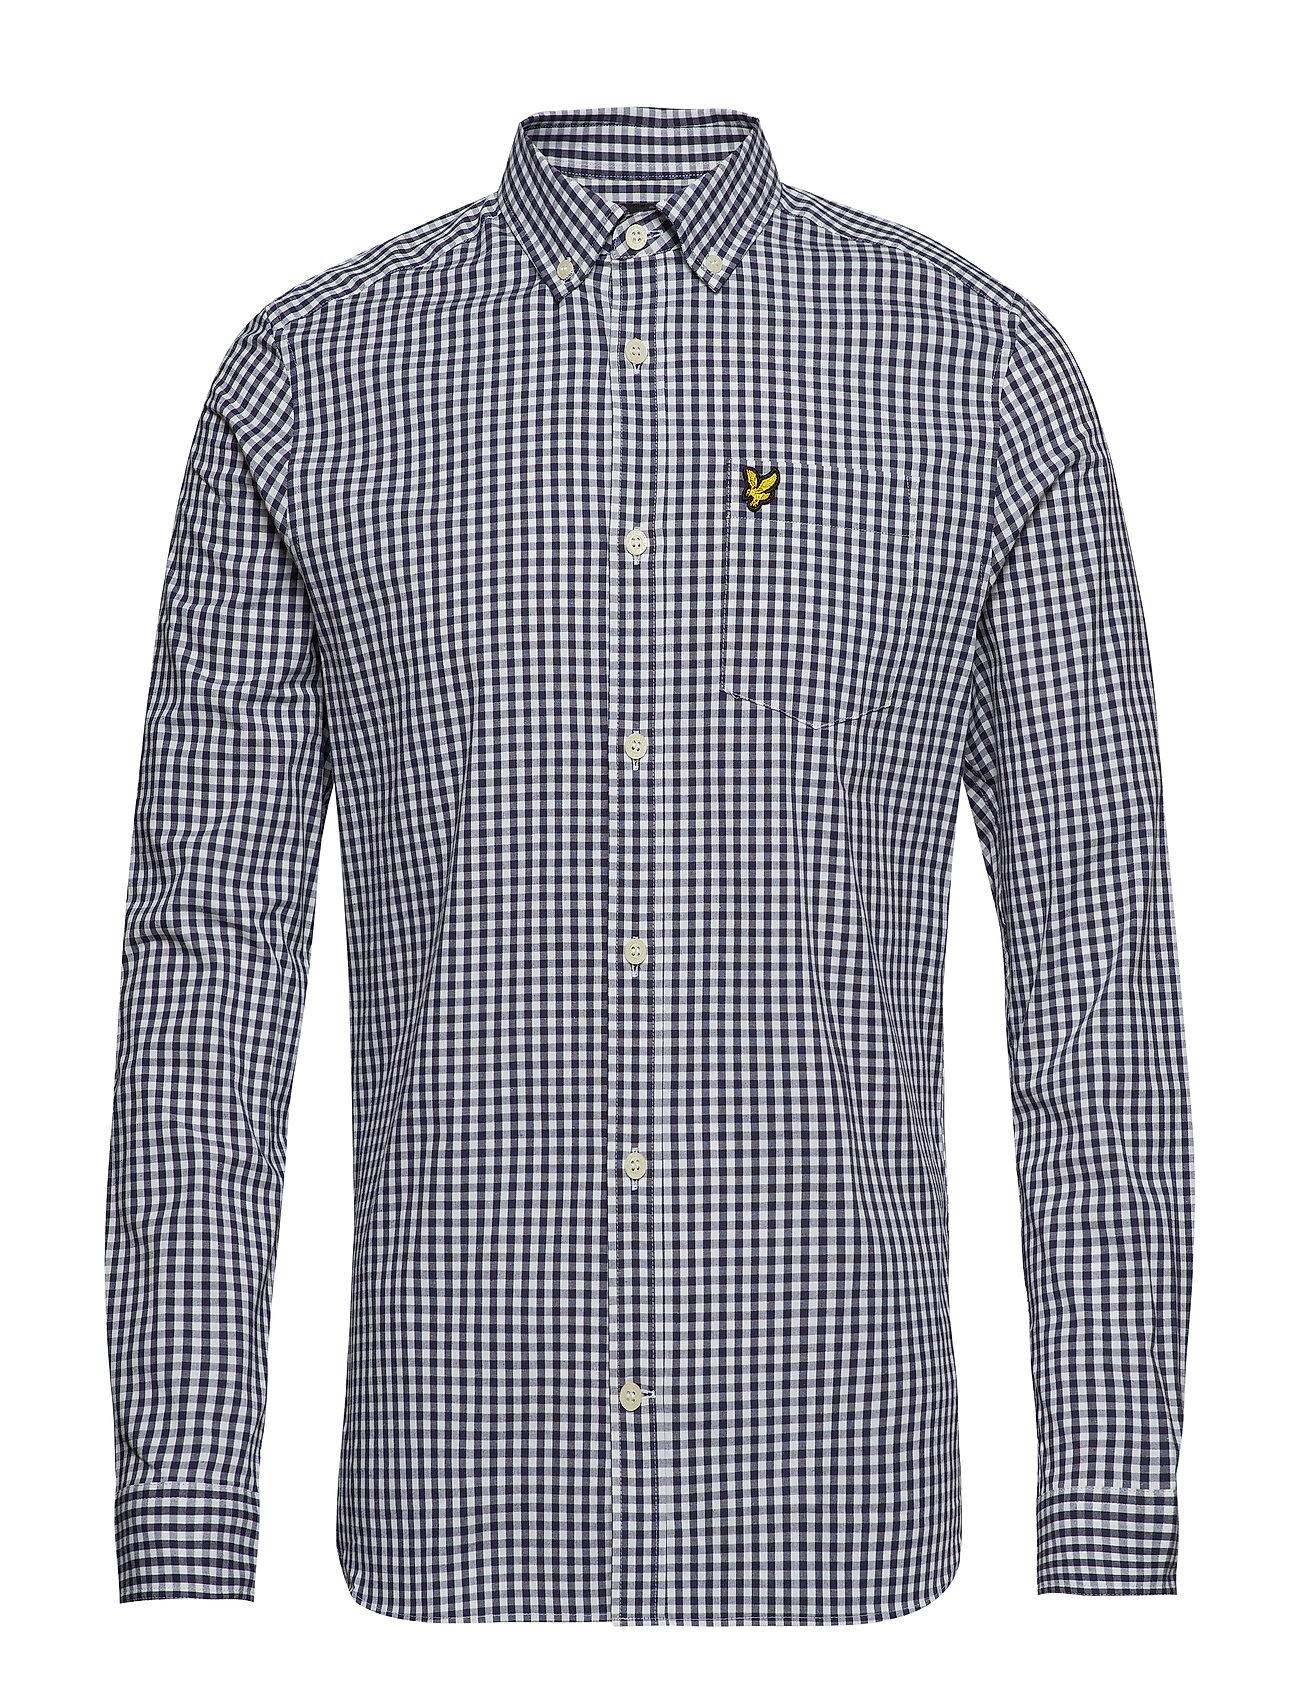 Lyle & Scott LS Slim Fit Gingham Shirt - NAVY/WHITE